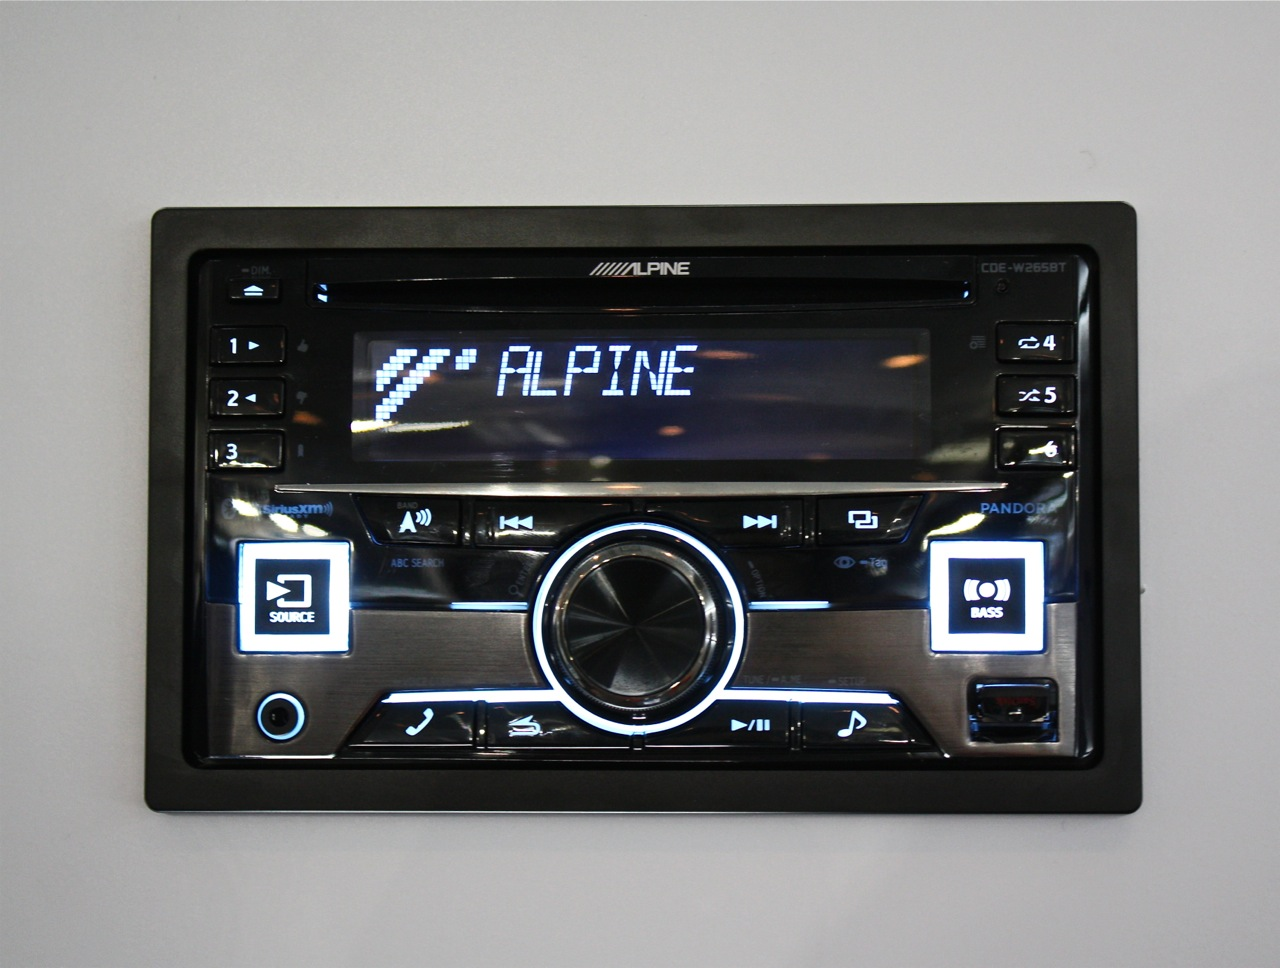 alpine car stereo wiring diagram 1994 4l60e cde w265bt 25 images